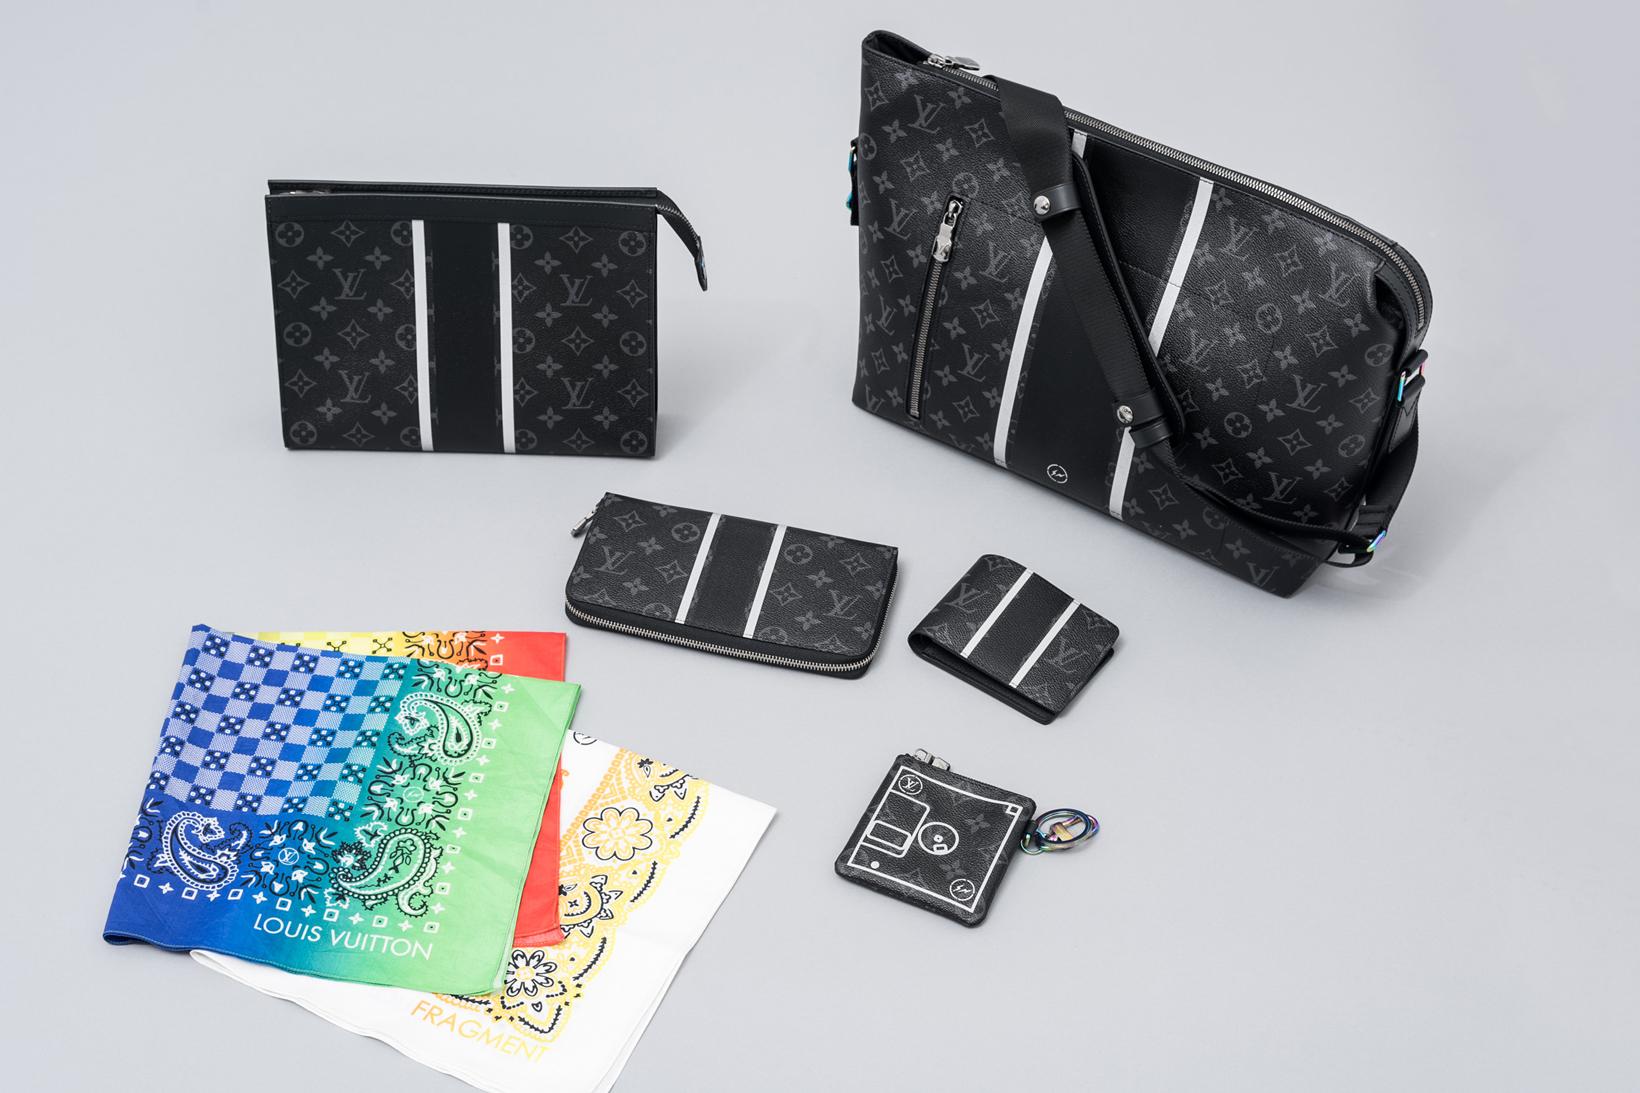 fragment design x Louis Vuitton Hiroshi Fujiwara - 3773577